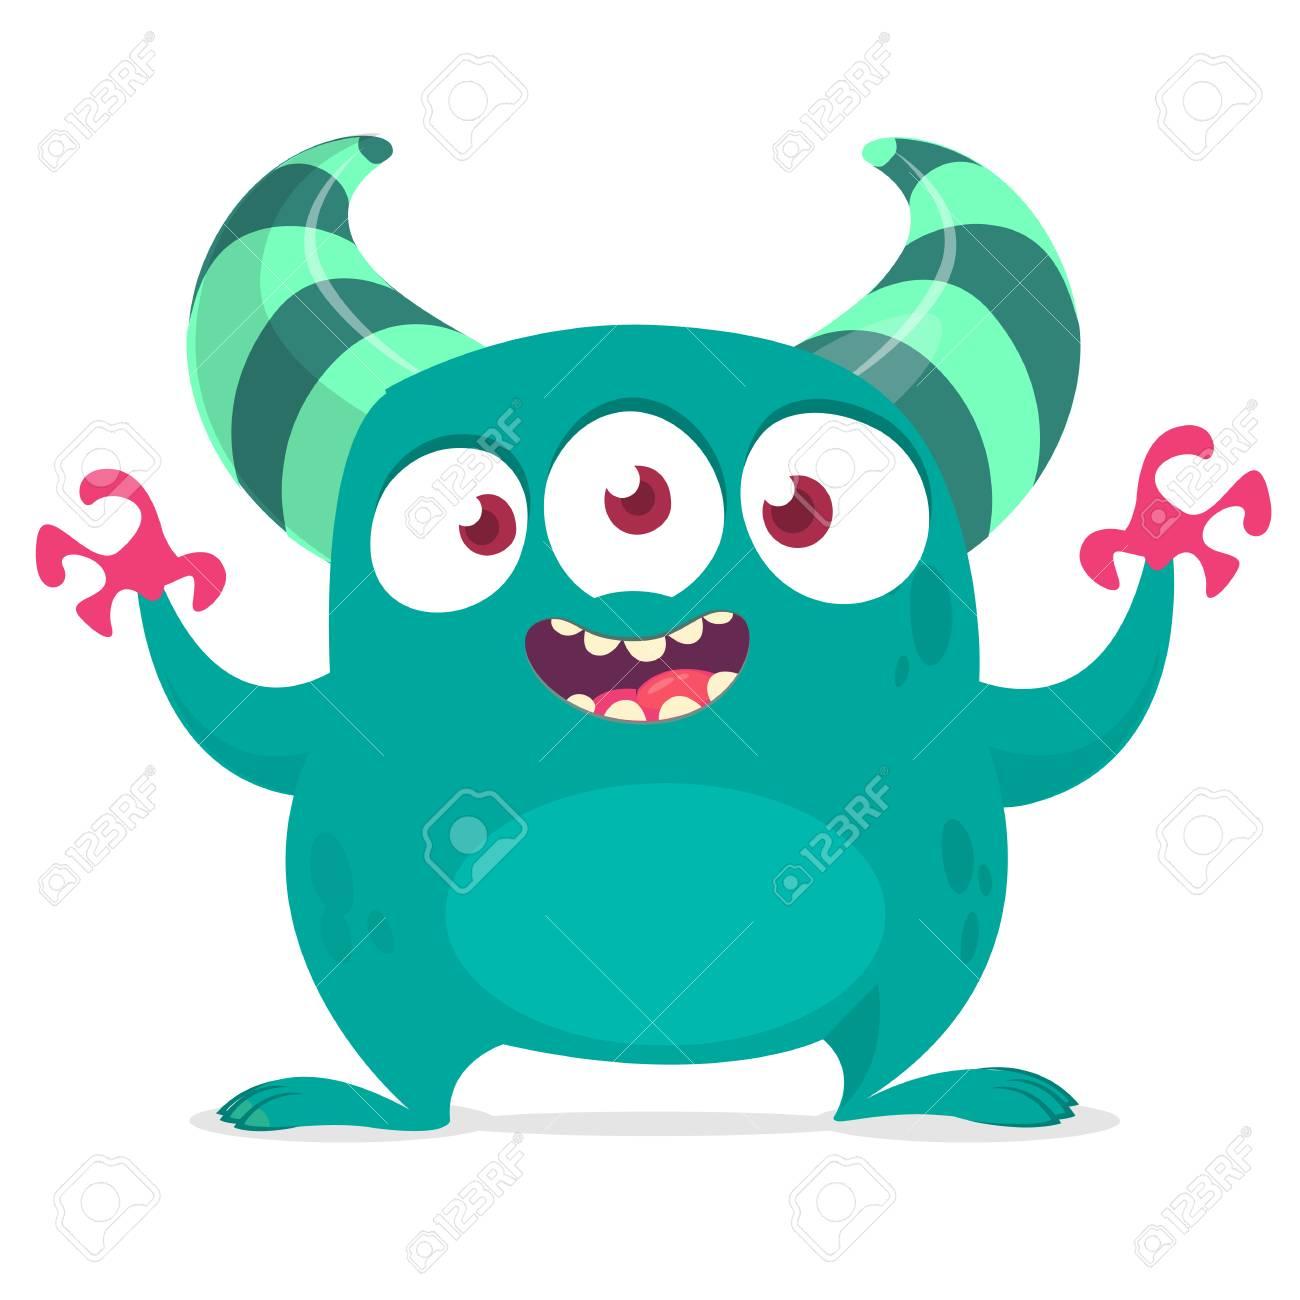 hight resolution of funny cartoon alien with three eyes vector illustration clipart stock vector 104064130